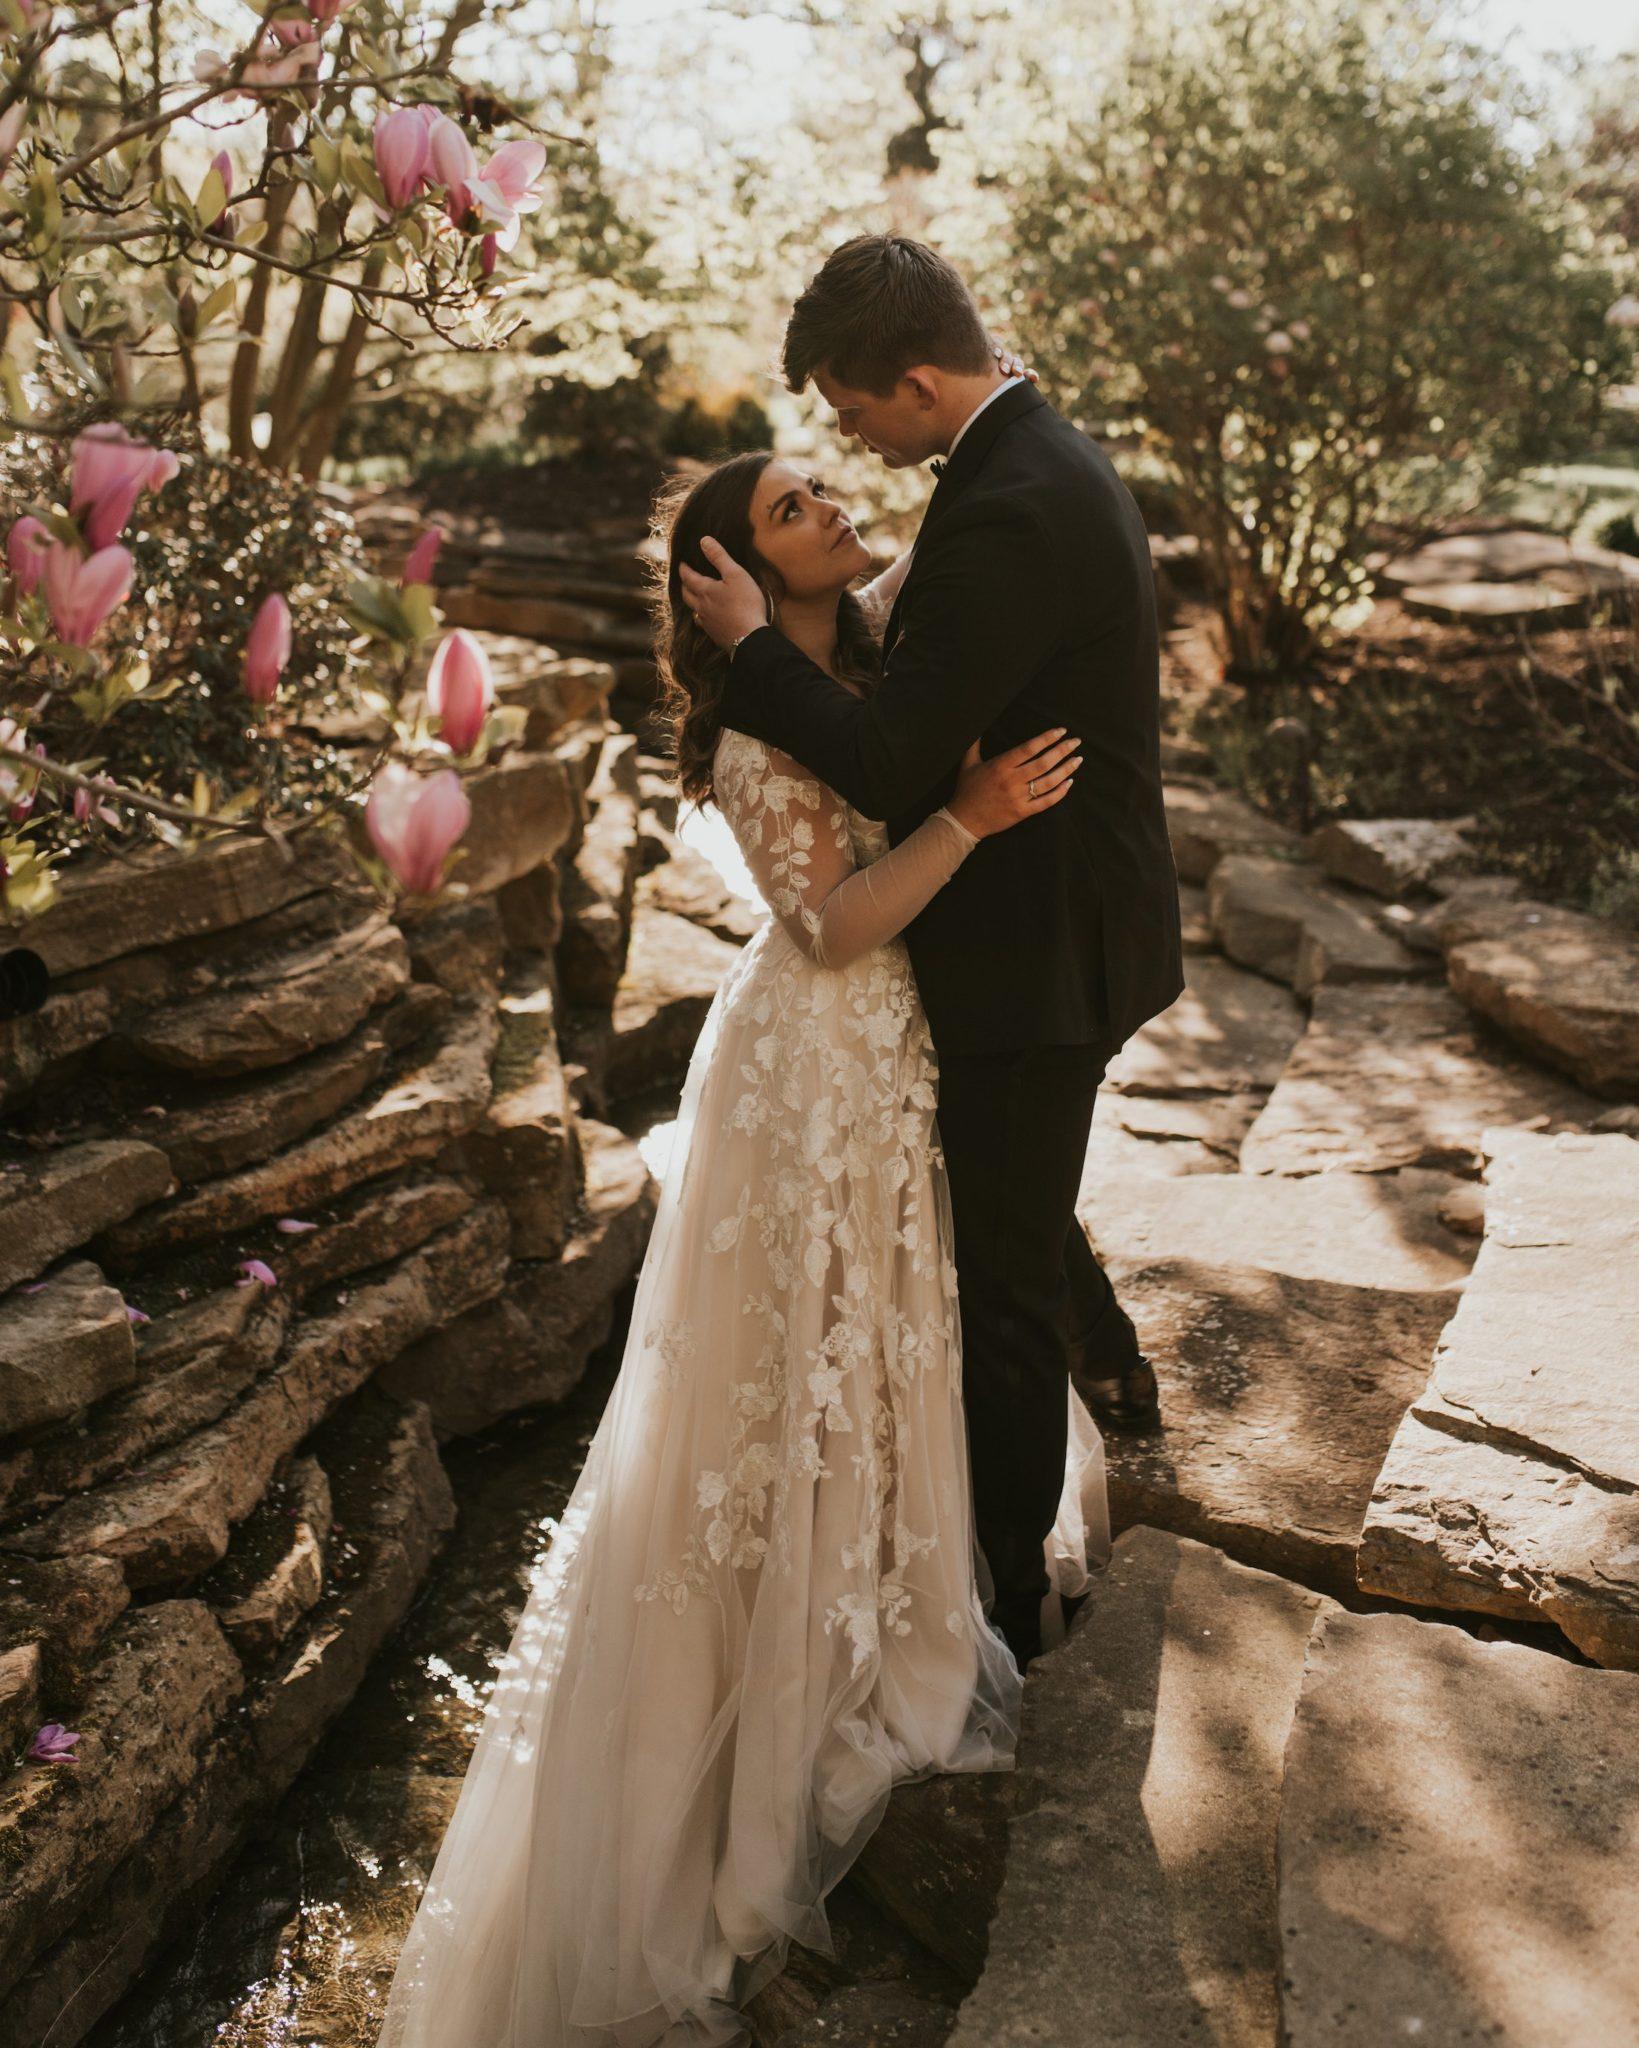 Bride and Groom embracing after wedding